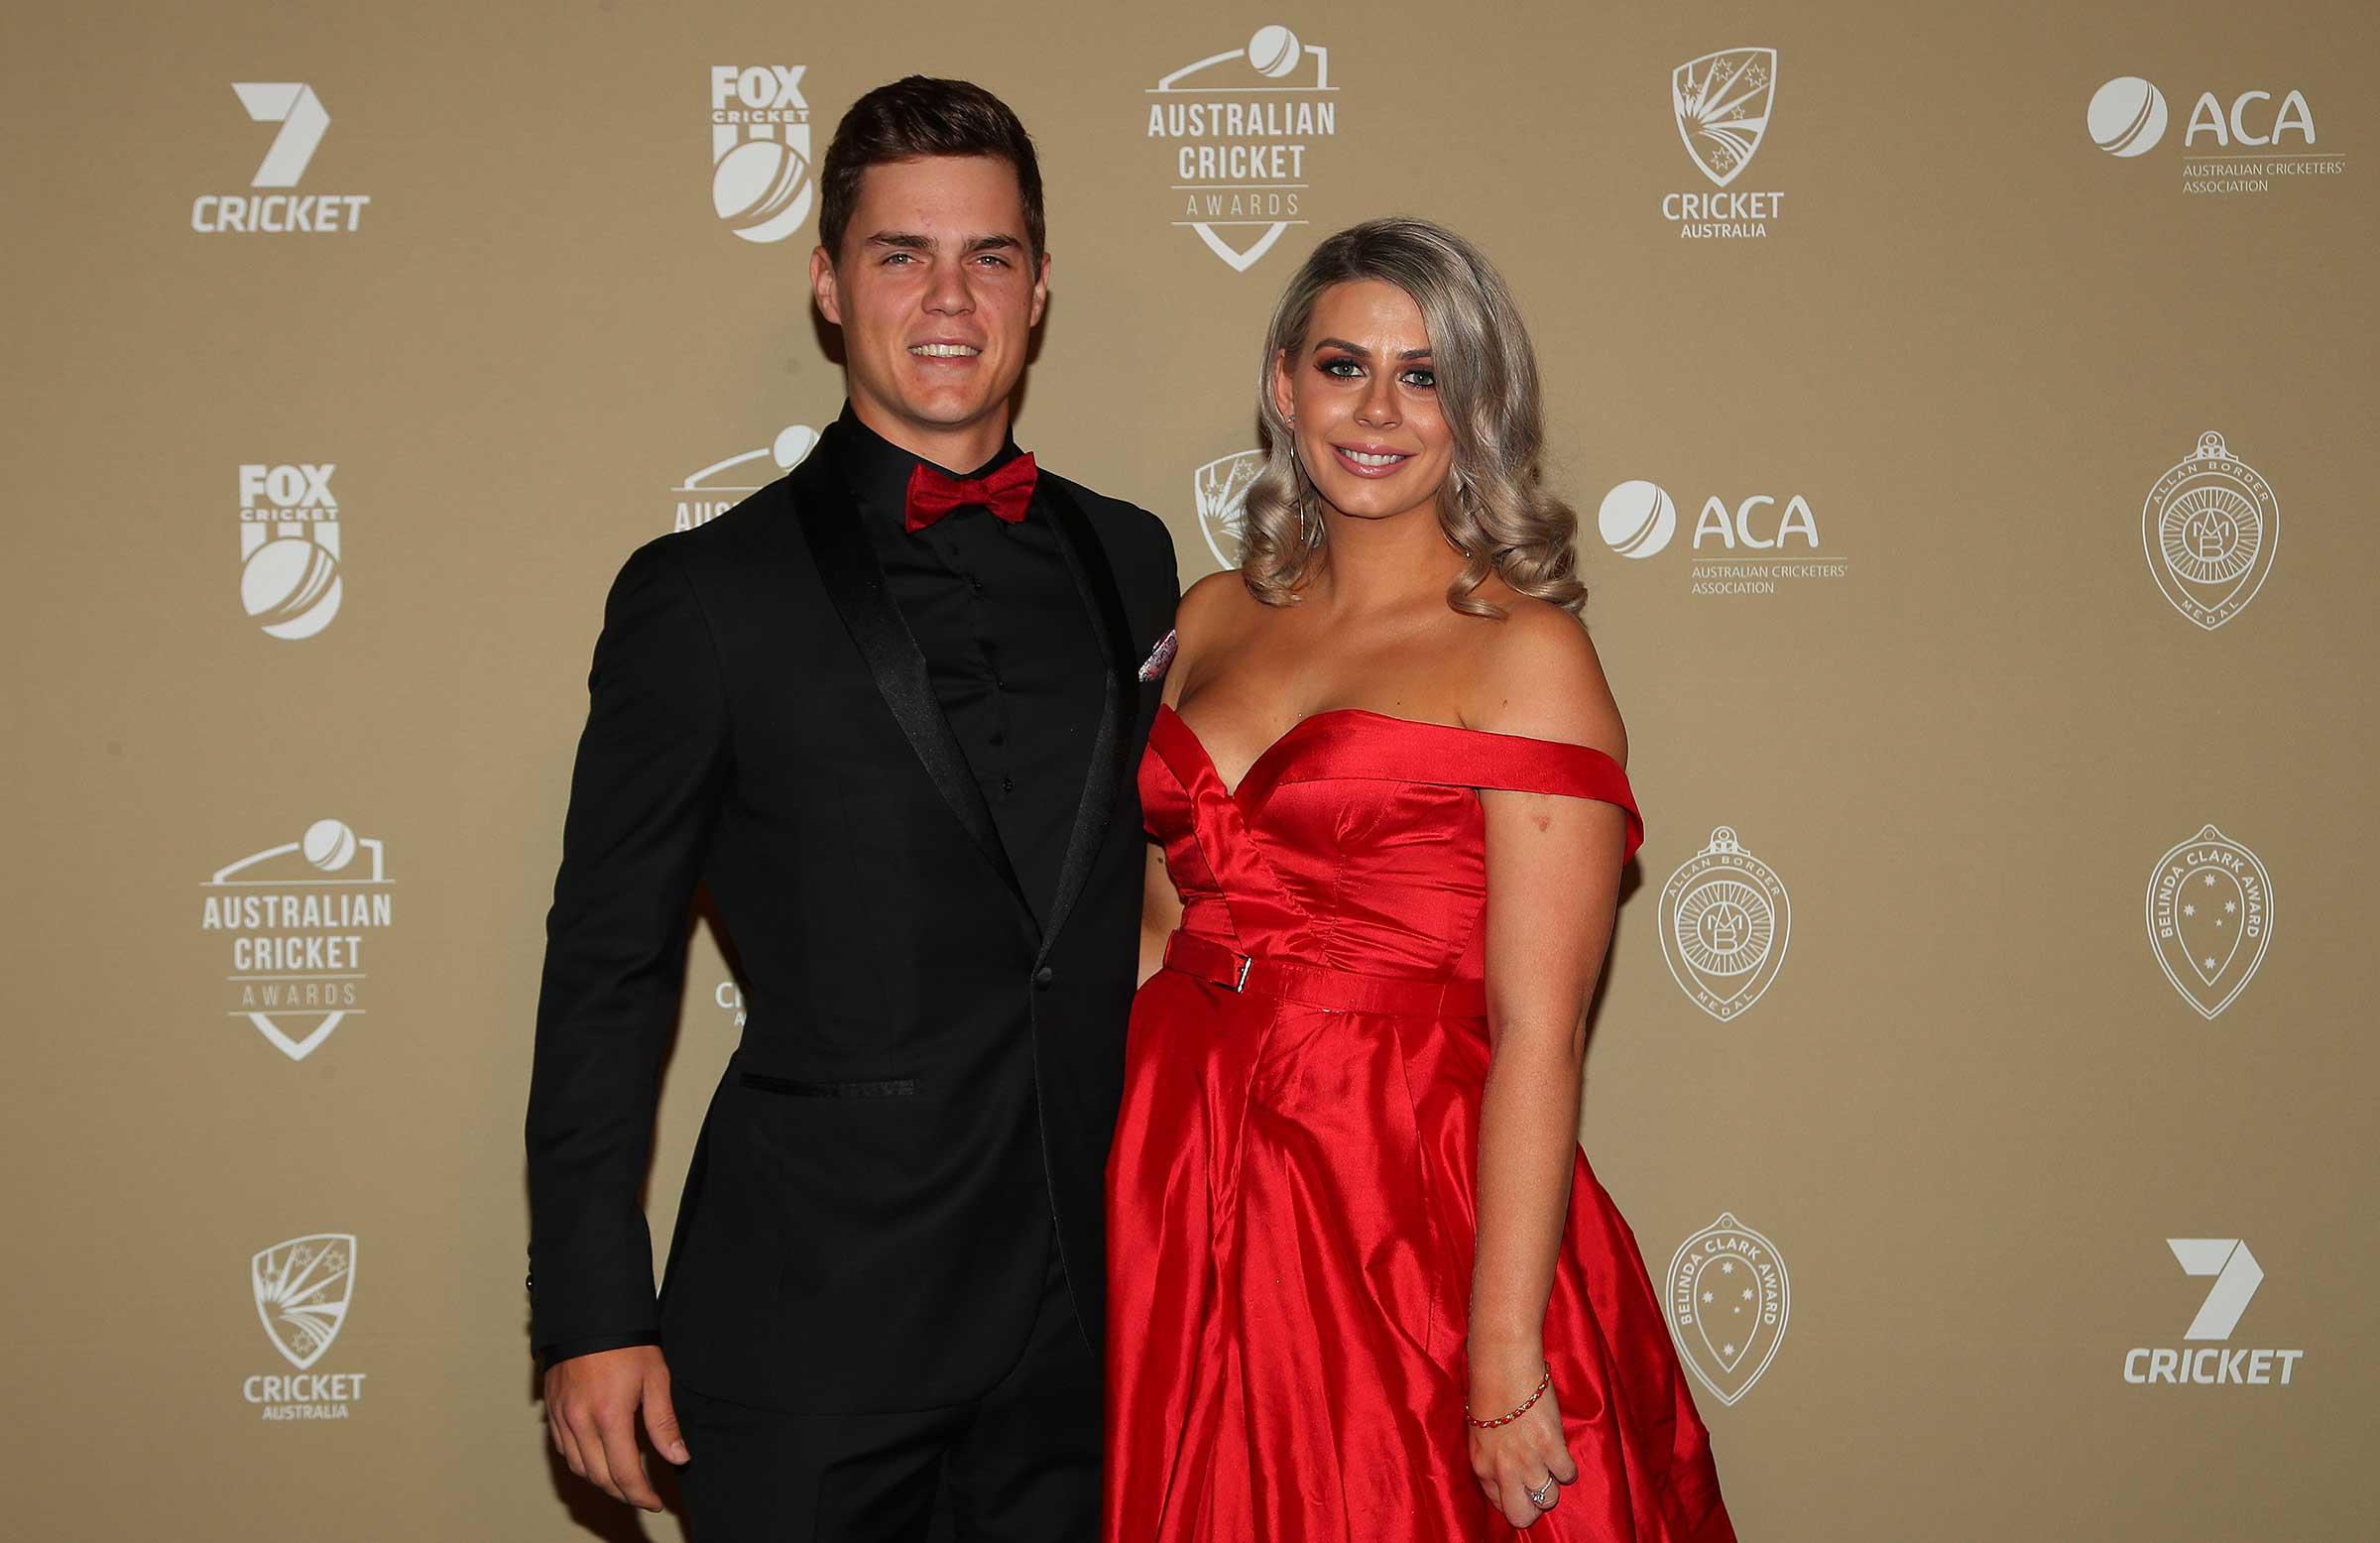 Mitch Swepson and partner Jessica Thorpe // Getty